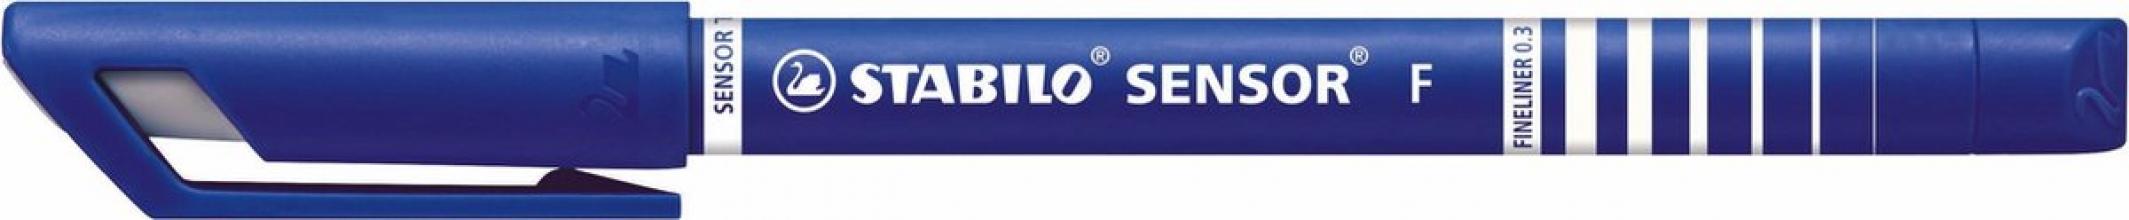 , Fineliner stabilo sensor 189/41 blauw